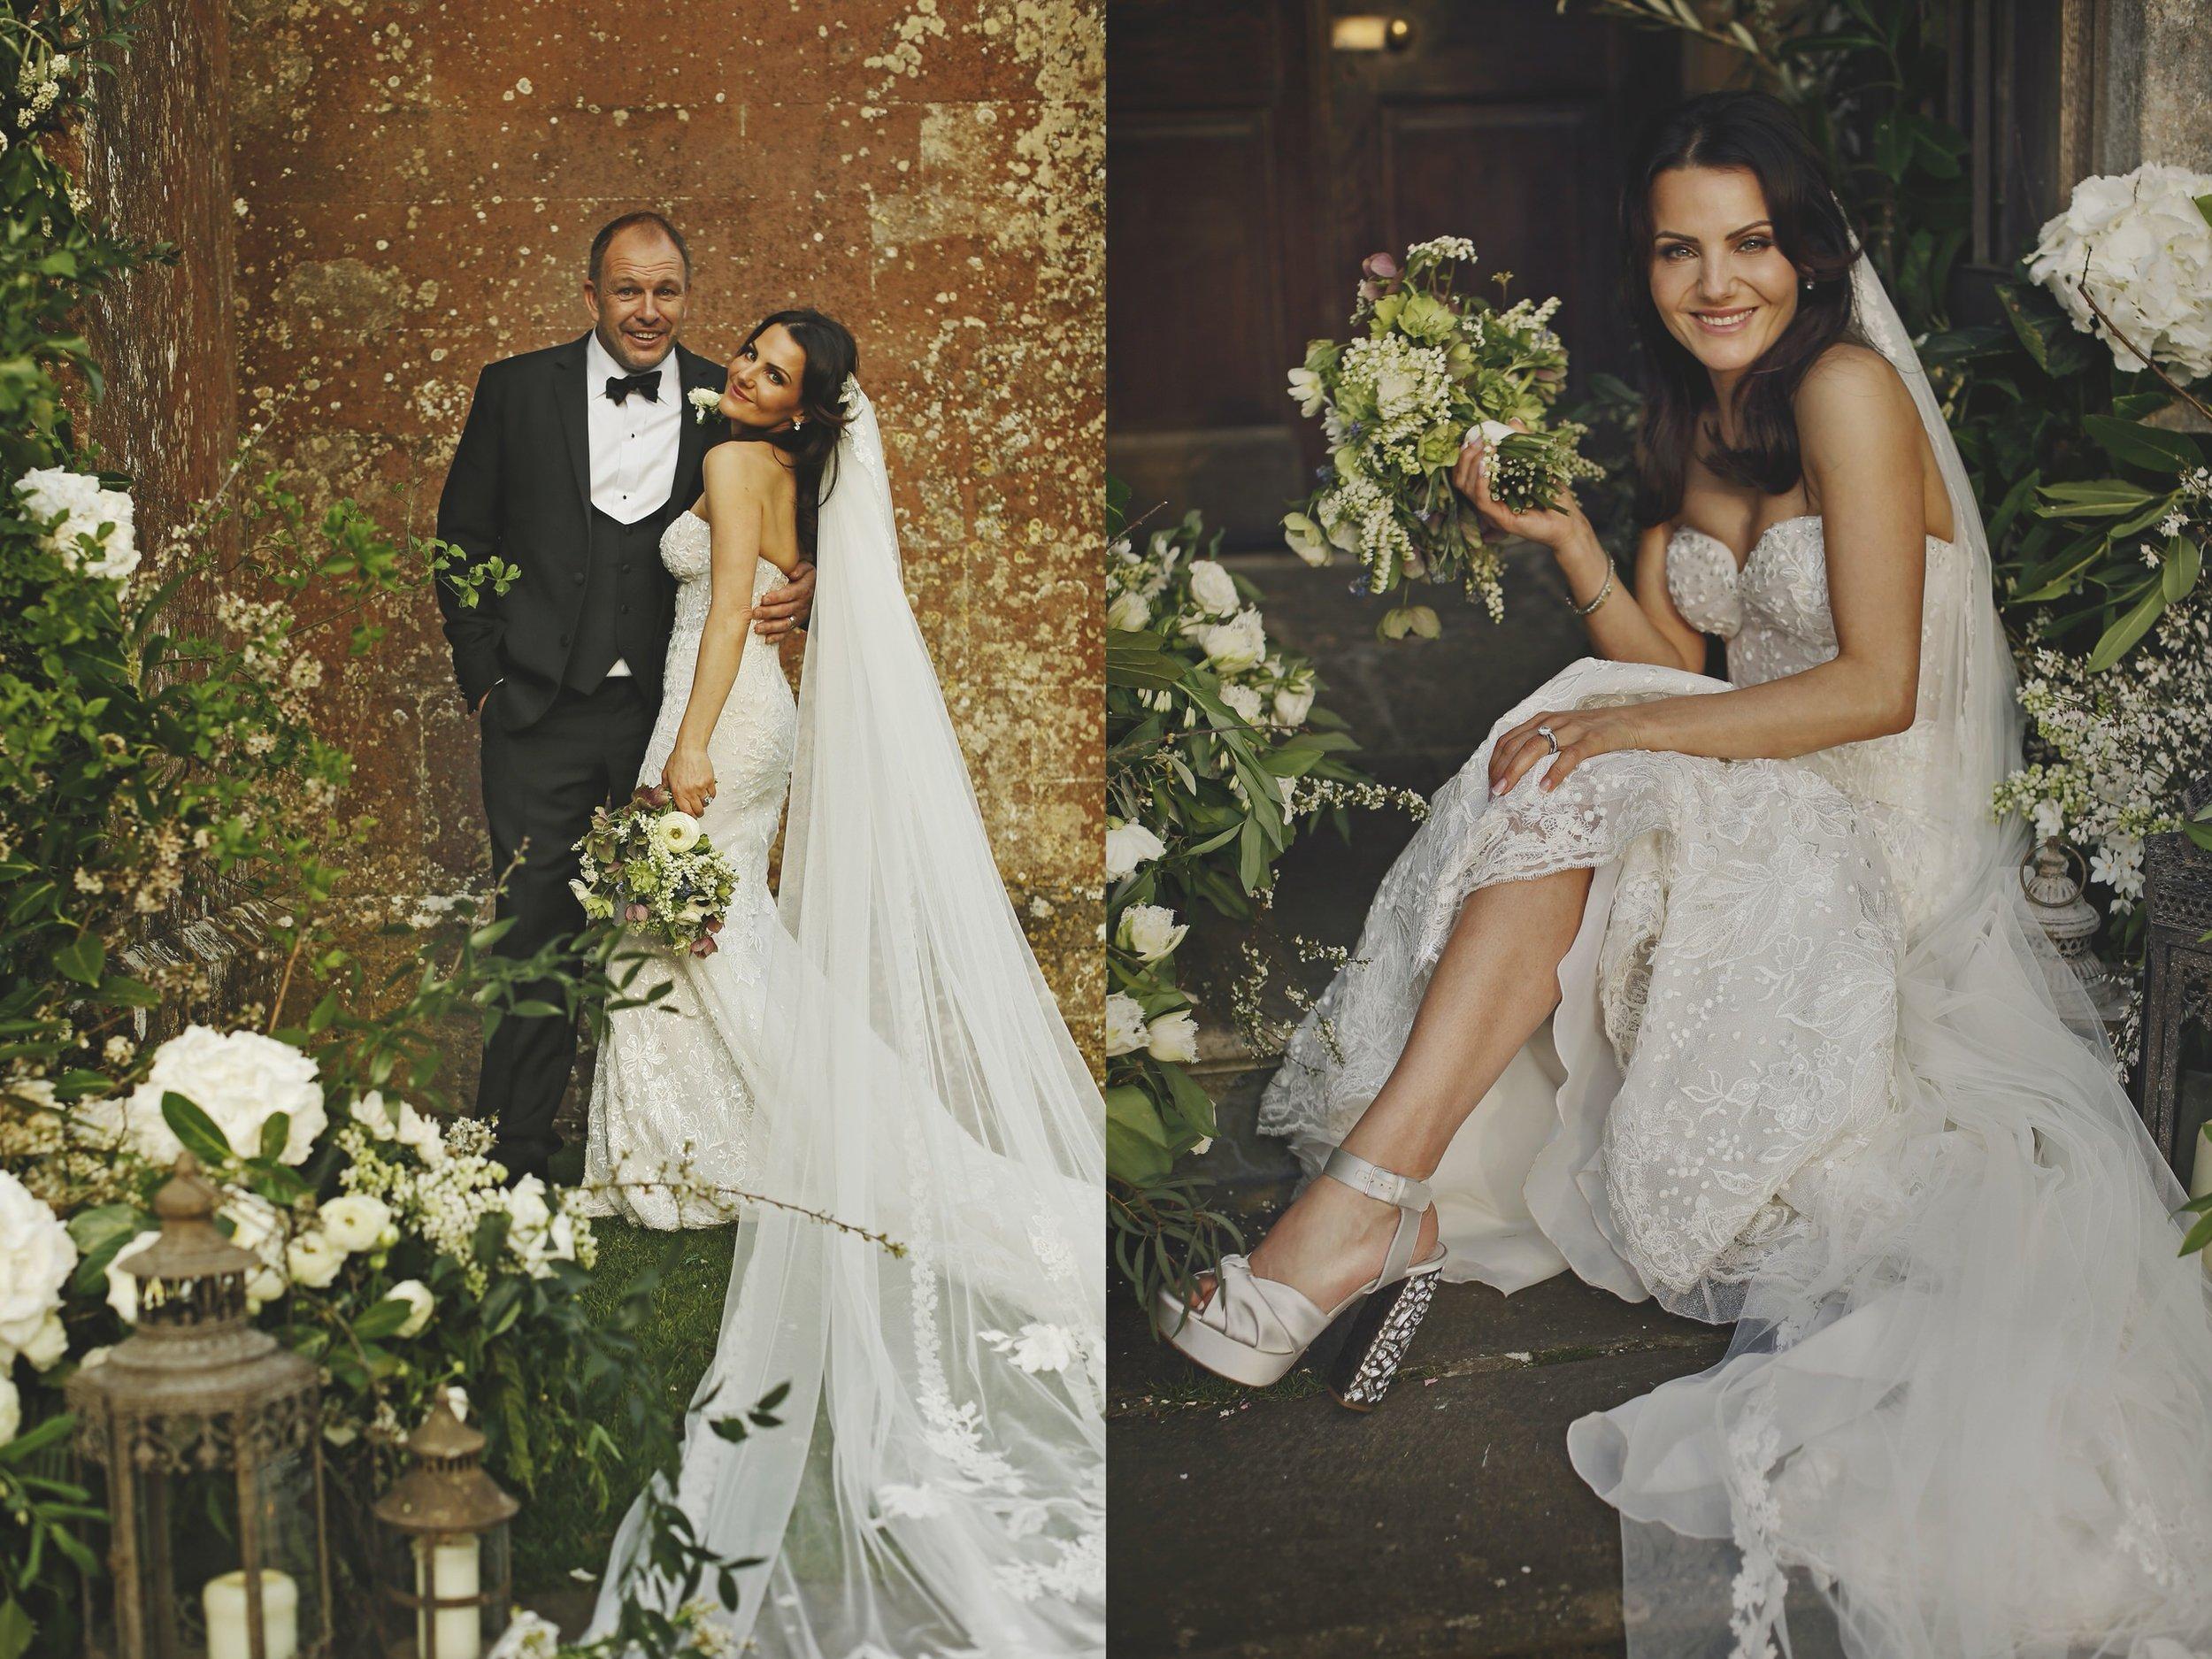 brettharkness-luxury-wedding-photographer-uk_0045.jpg